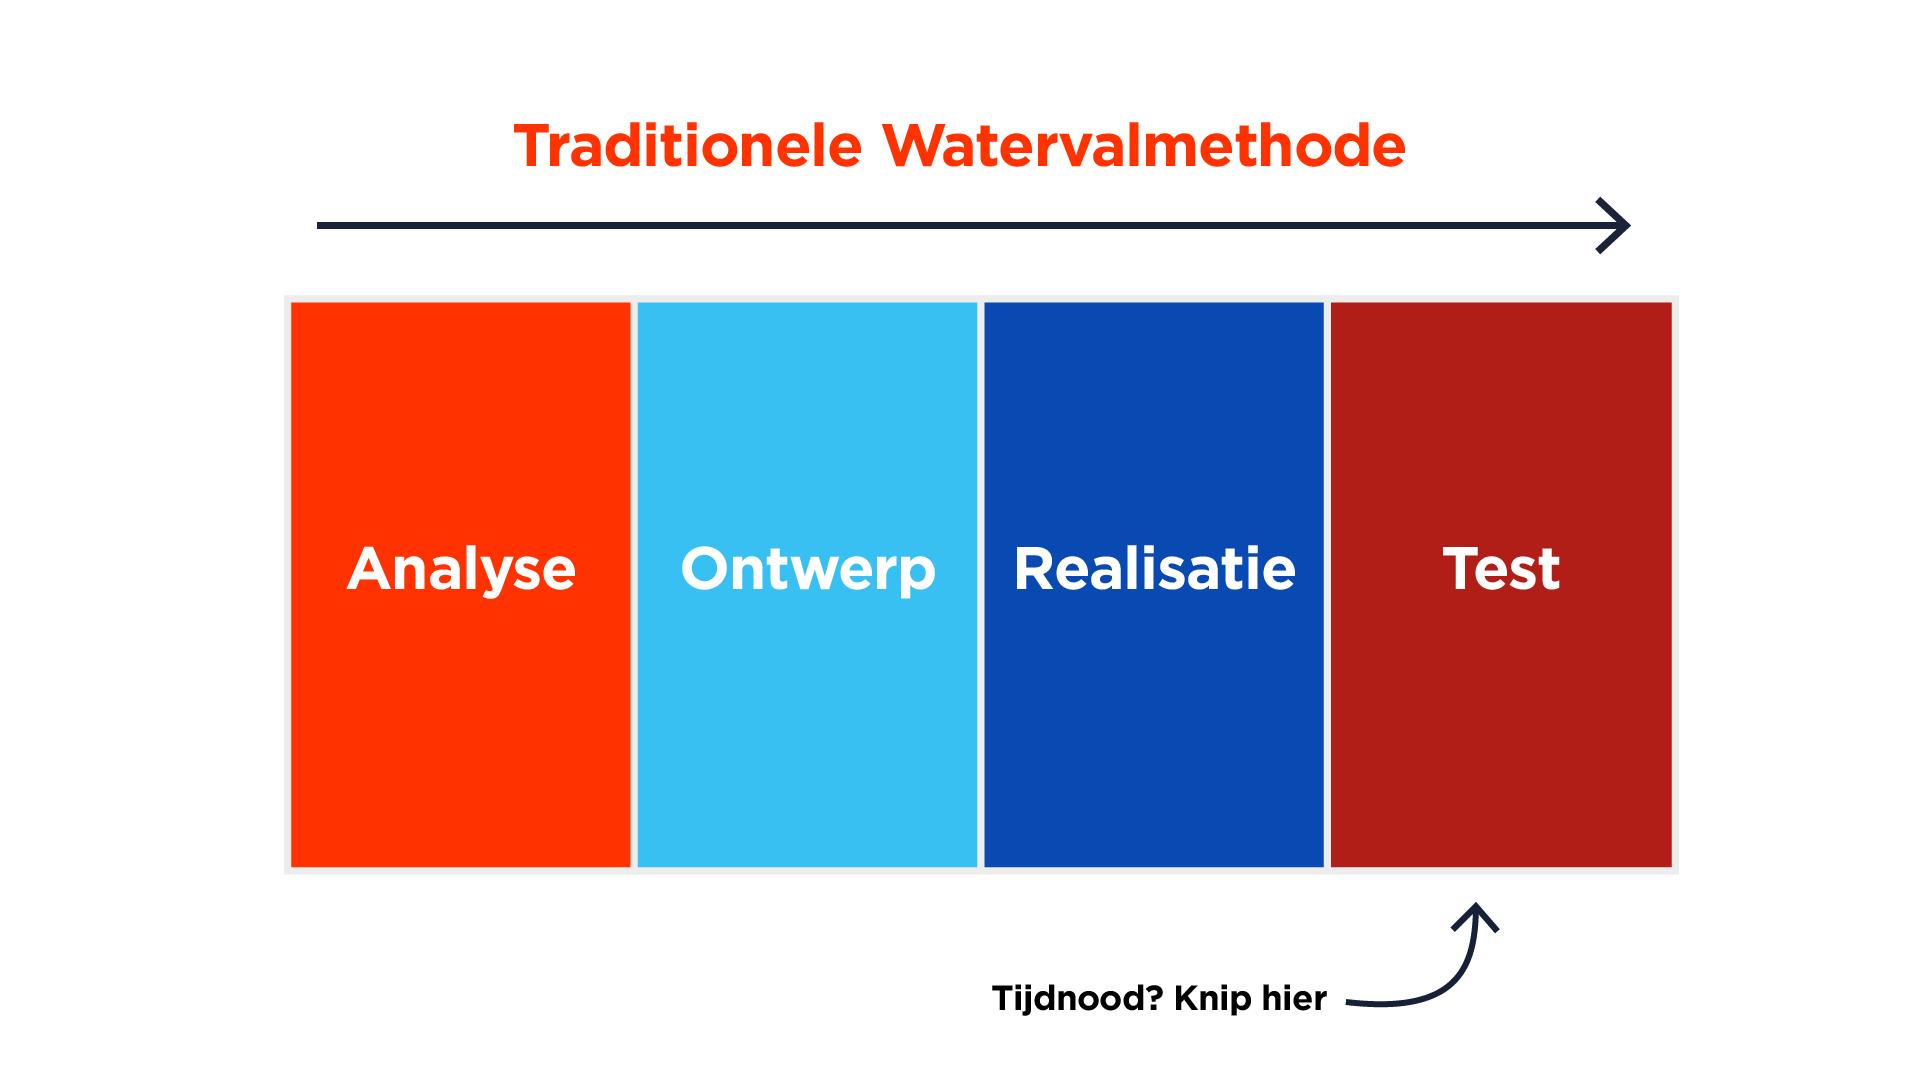 Traditionele Watervalmethode